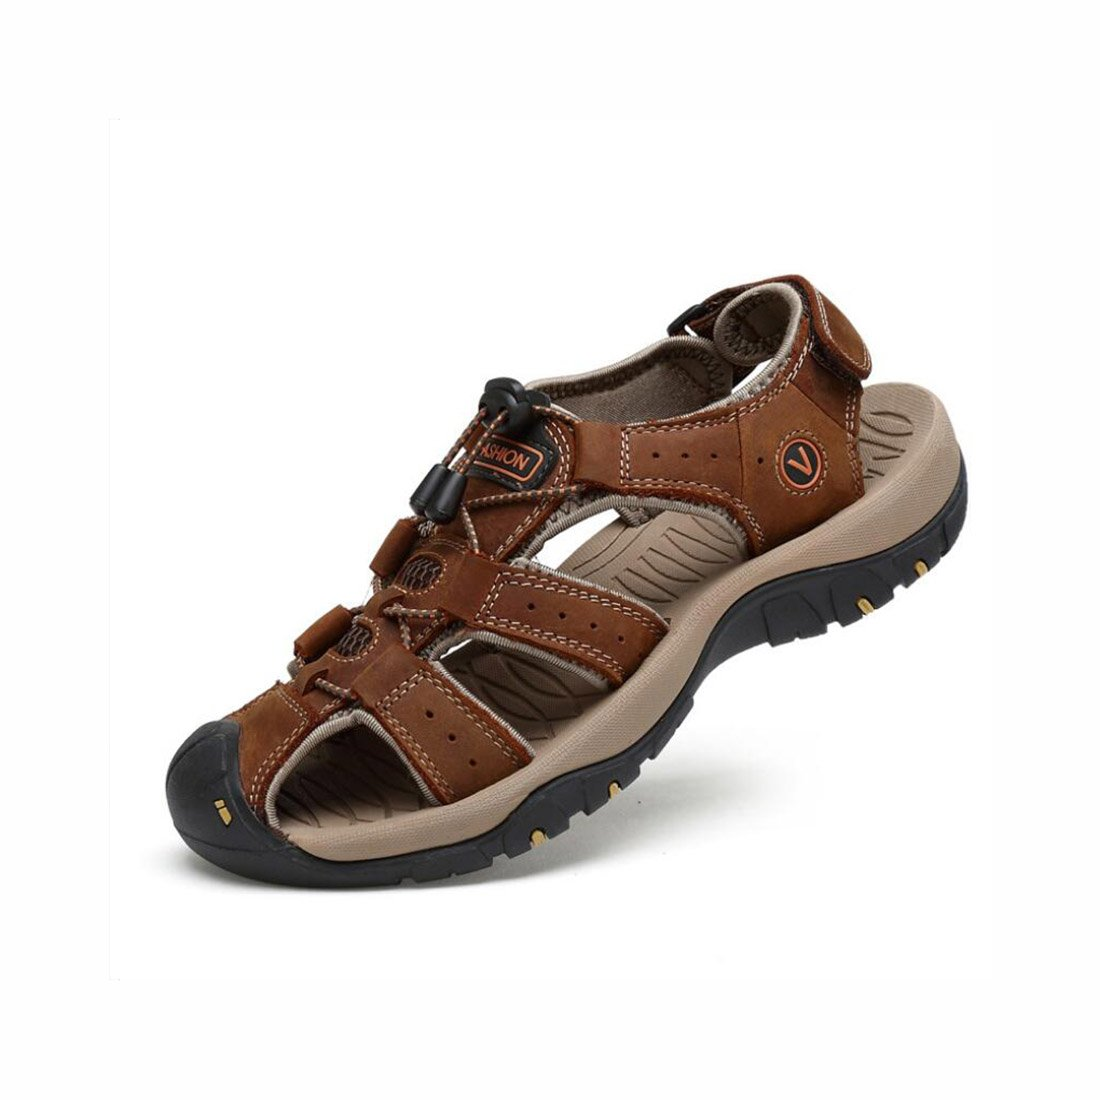 best loved c8834 cd9df Summer Men s Leather Beach Sandals Outdoor Outdoor Outdoor Sports  Walking Trekking Sandals Closed-Toe Velcro Breathable Trekking Sandals Shoes  (Color   2, ...